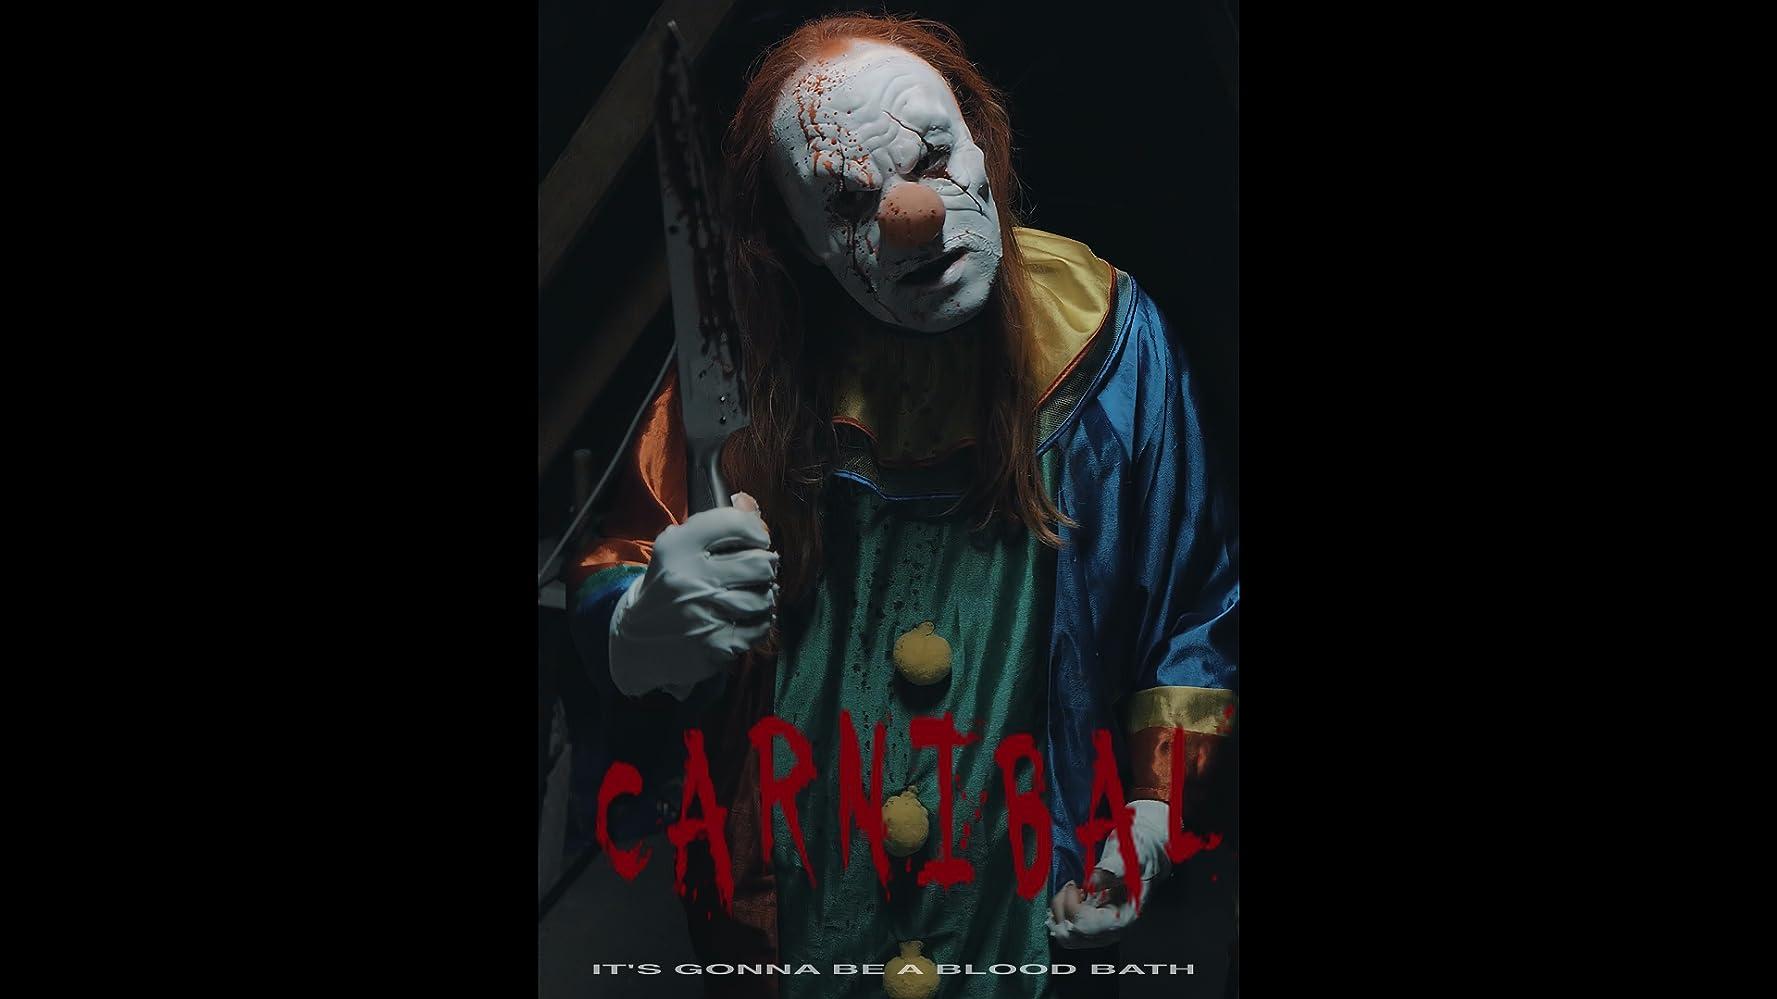 carnibal 2017